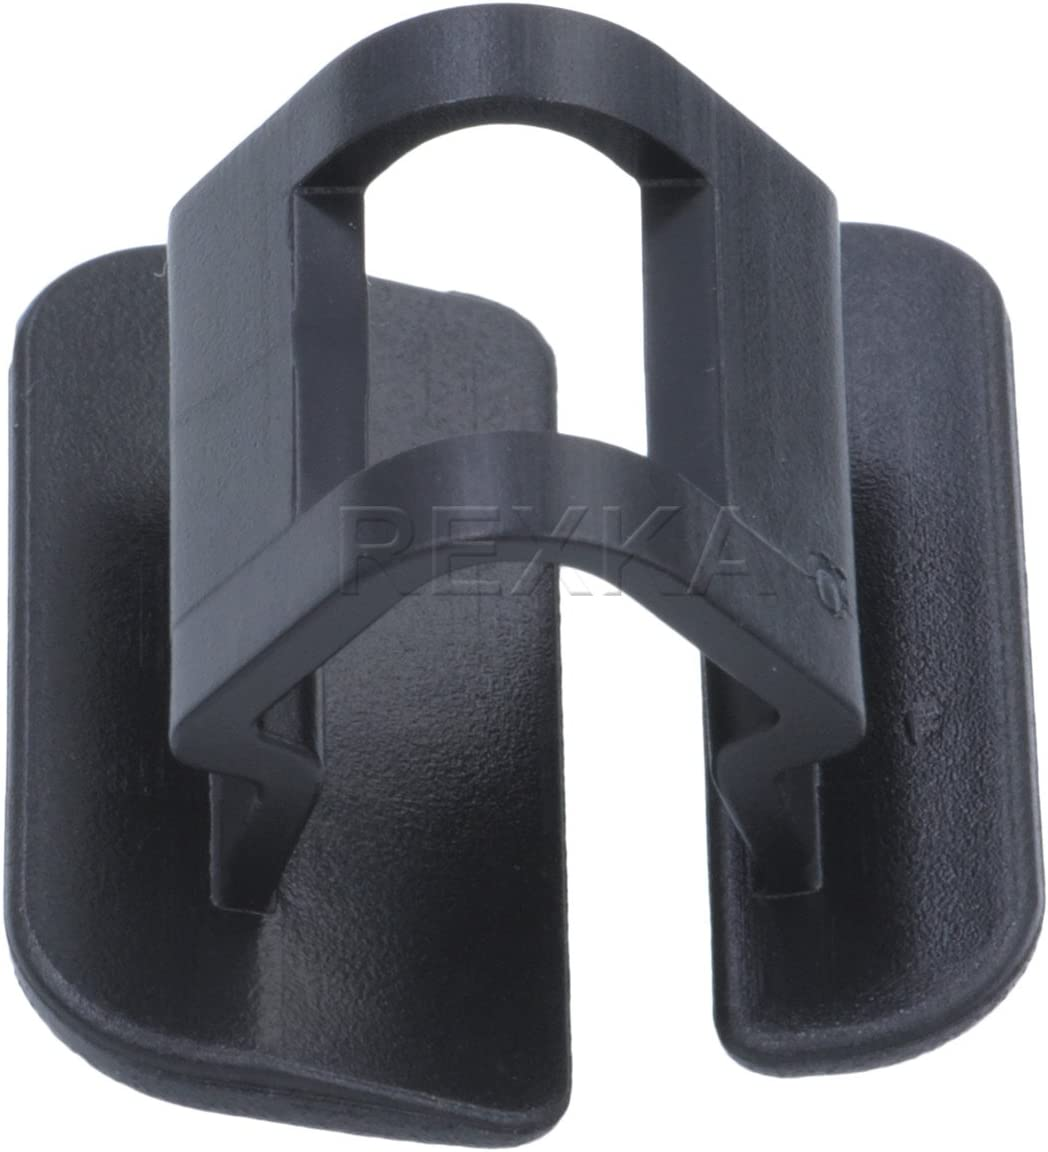 For Volvo C30 C70 S40 S60 S80 V70 XC60 XC90 Hood Insulation Pad Clip OEM 9182822